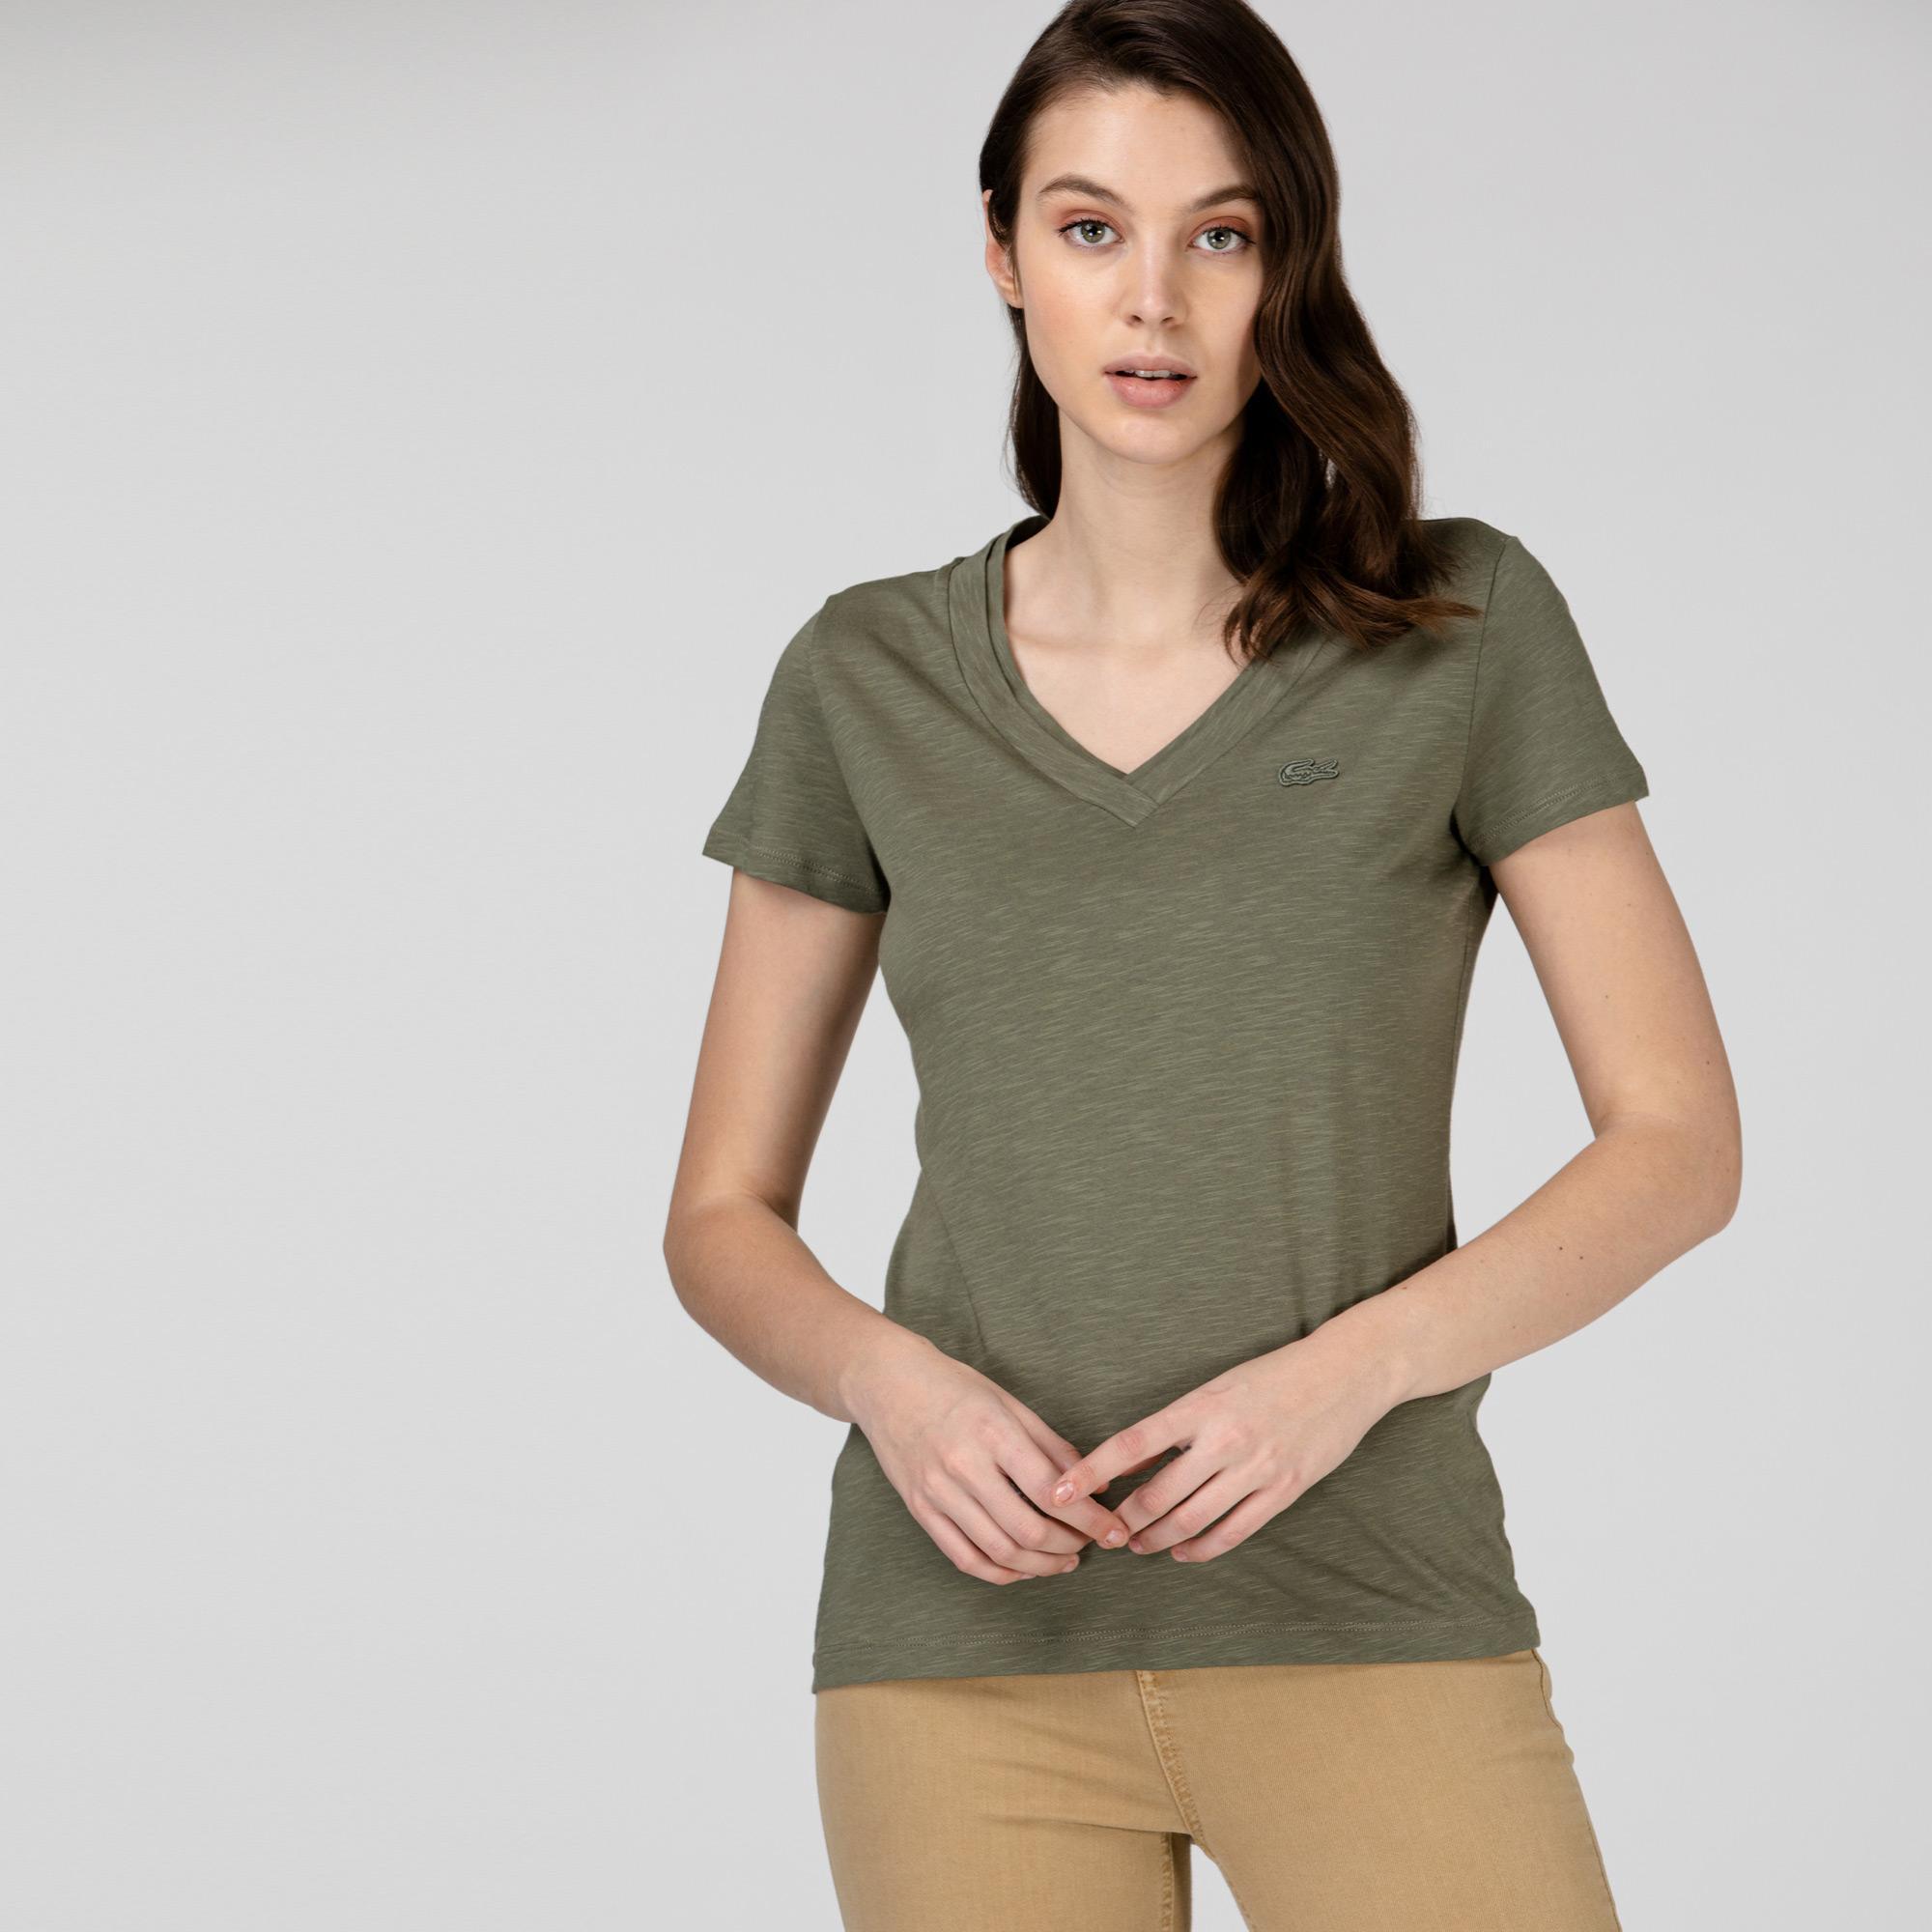 Lacoste Kadın Slim Fit V Yaka Haki T-Shirt